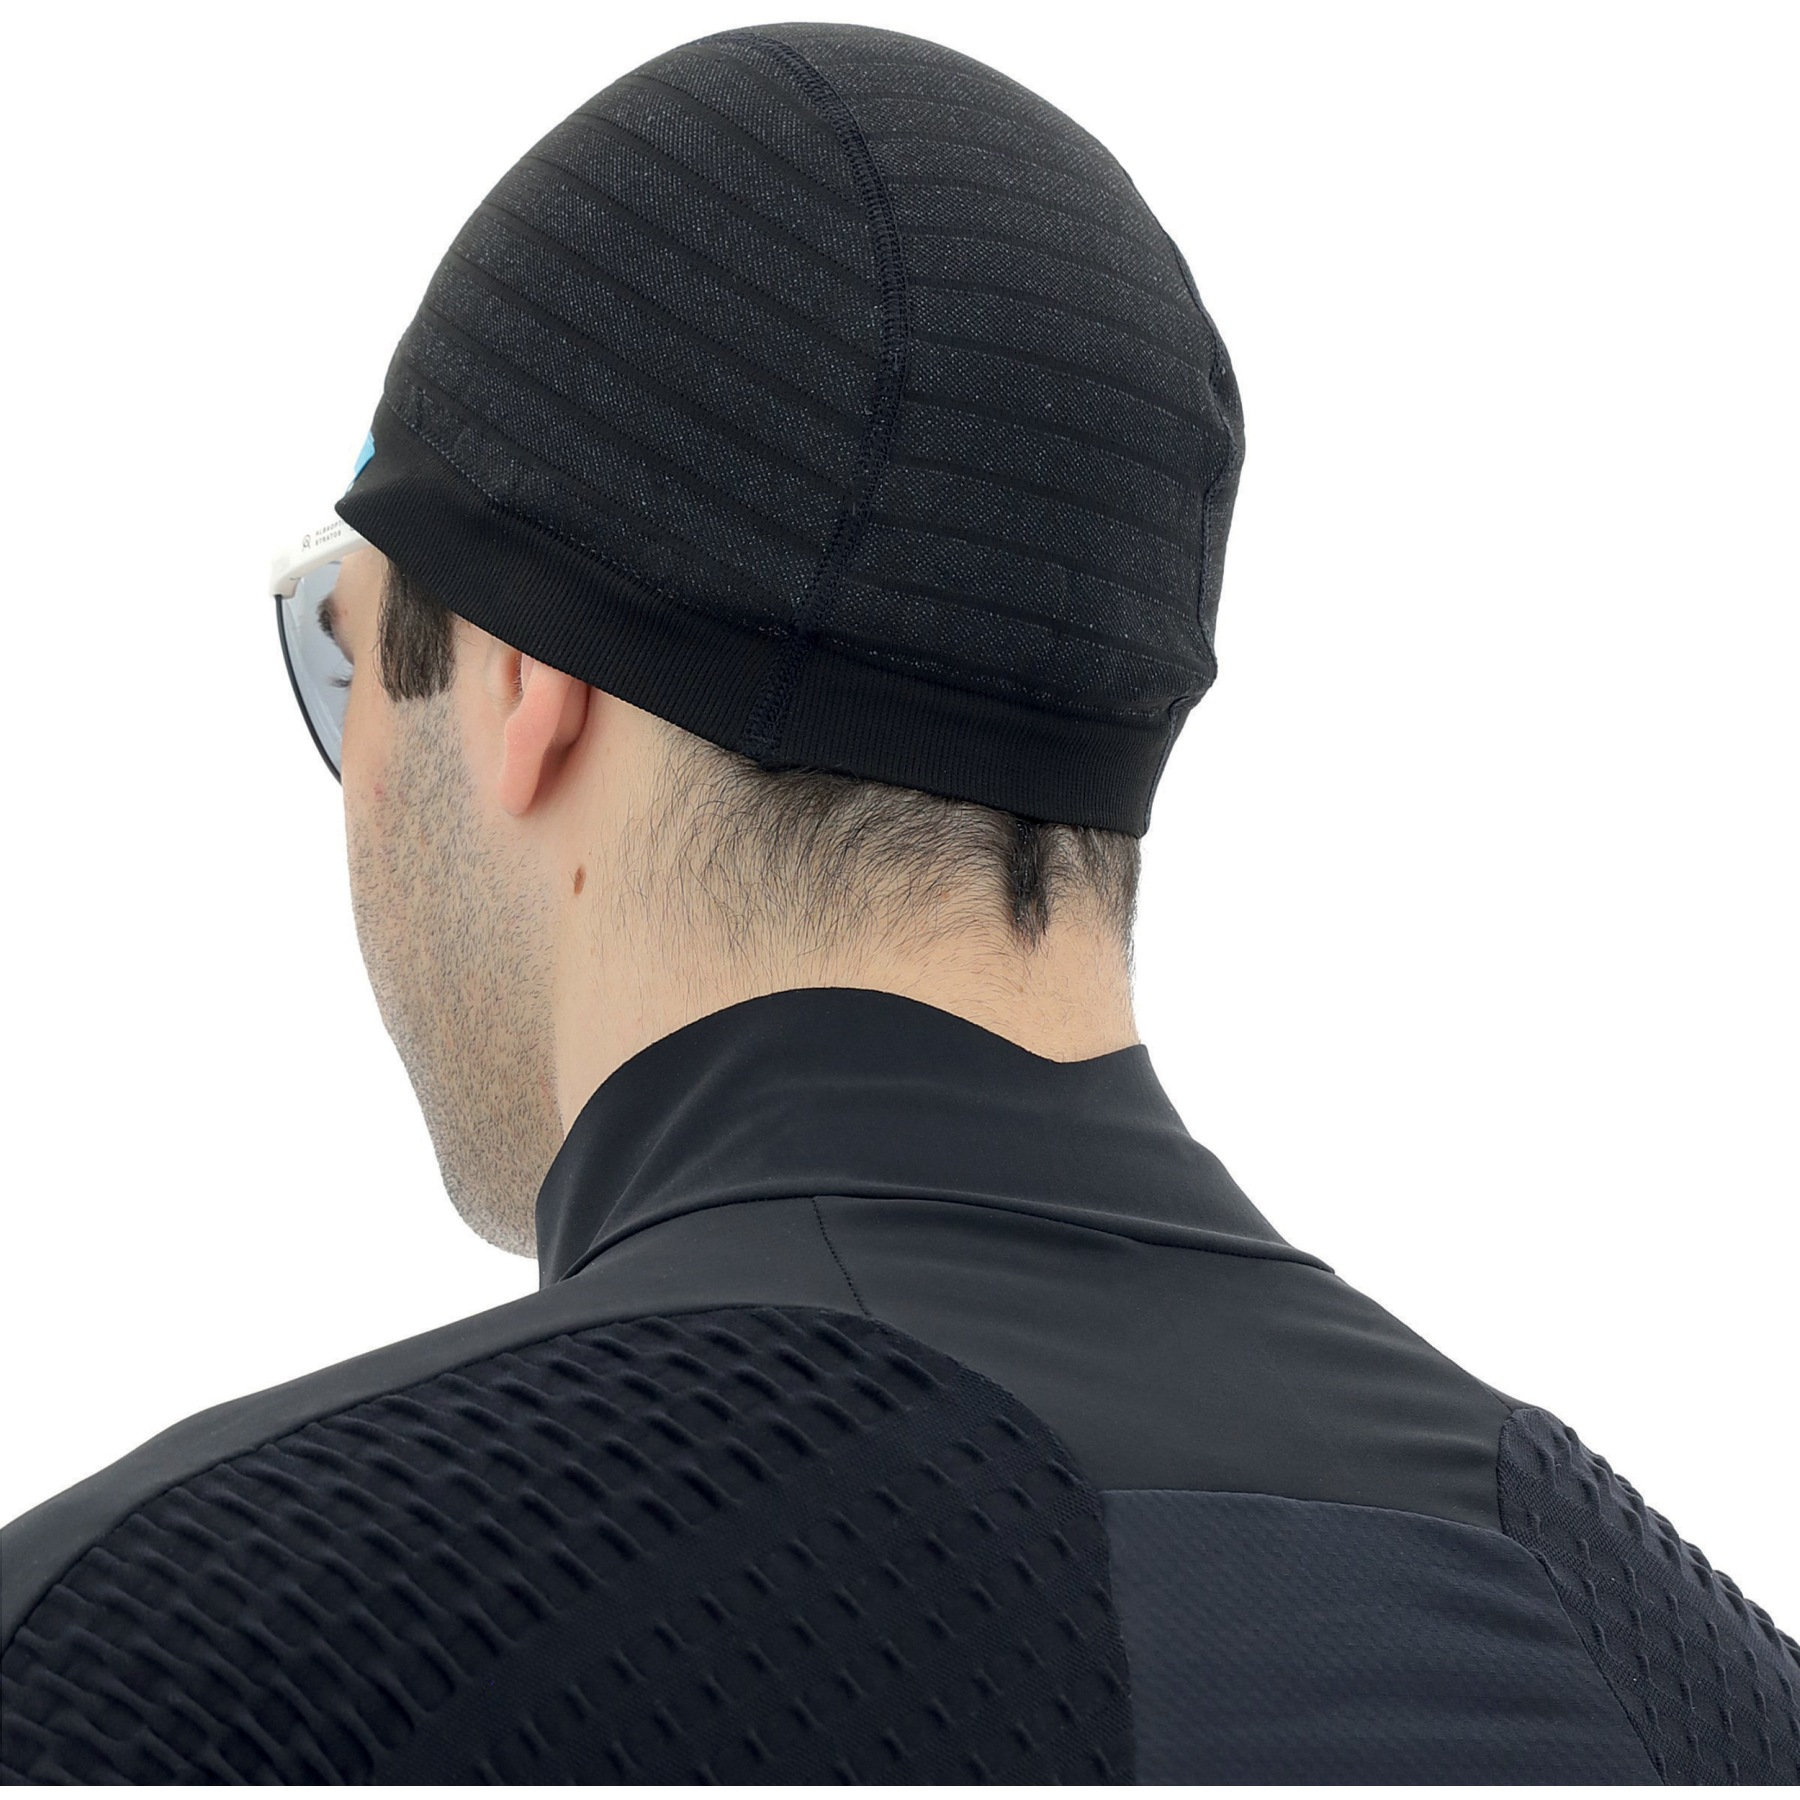 Image of UYN Buffercone Under Helmet Unisex - Black/Anthracite